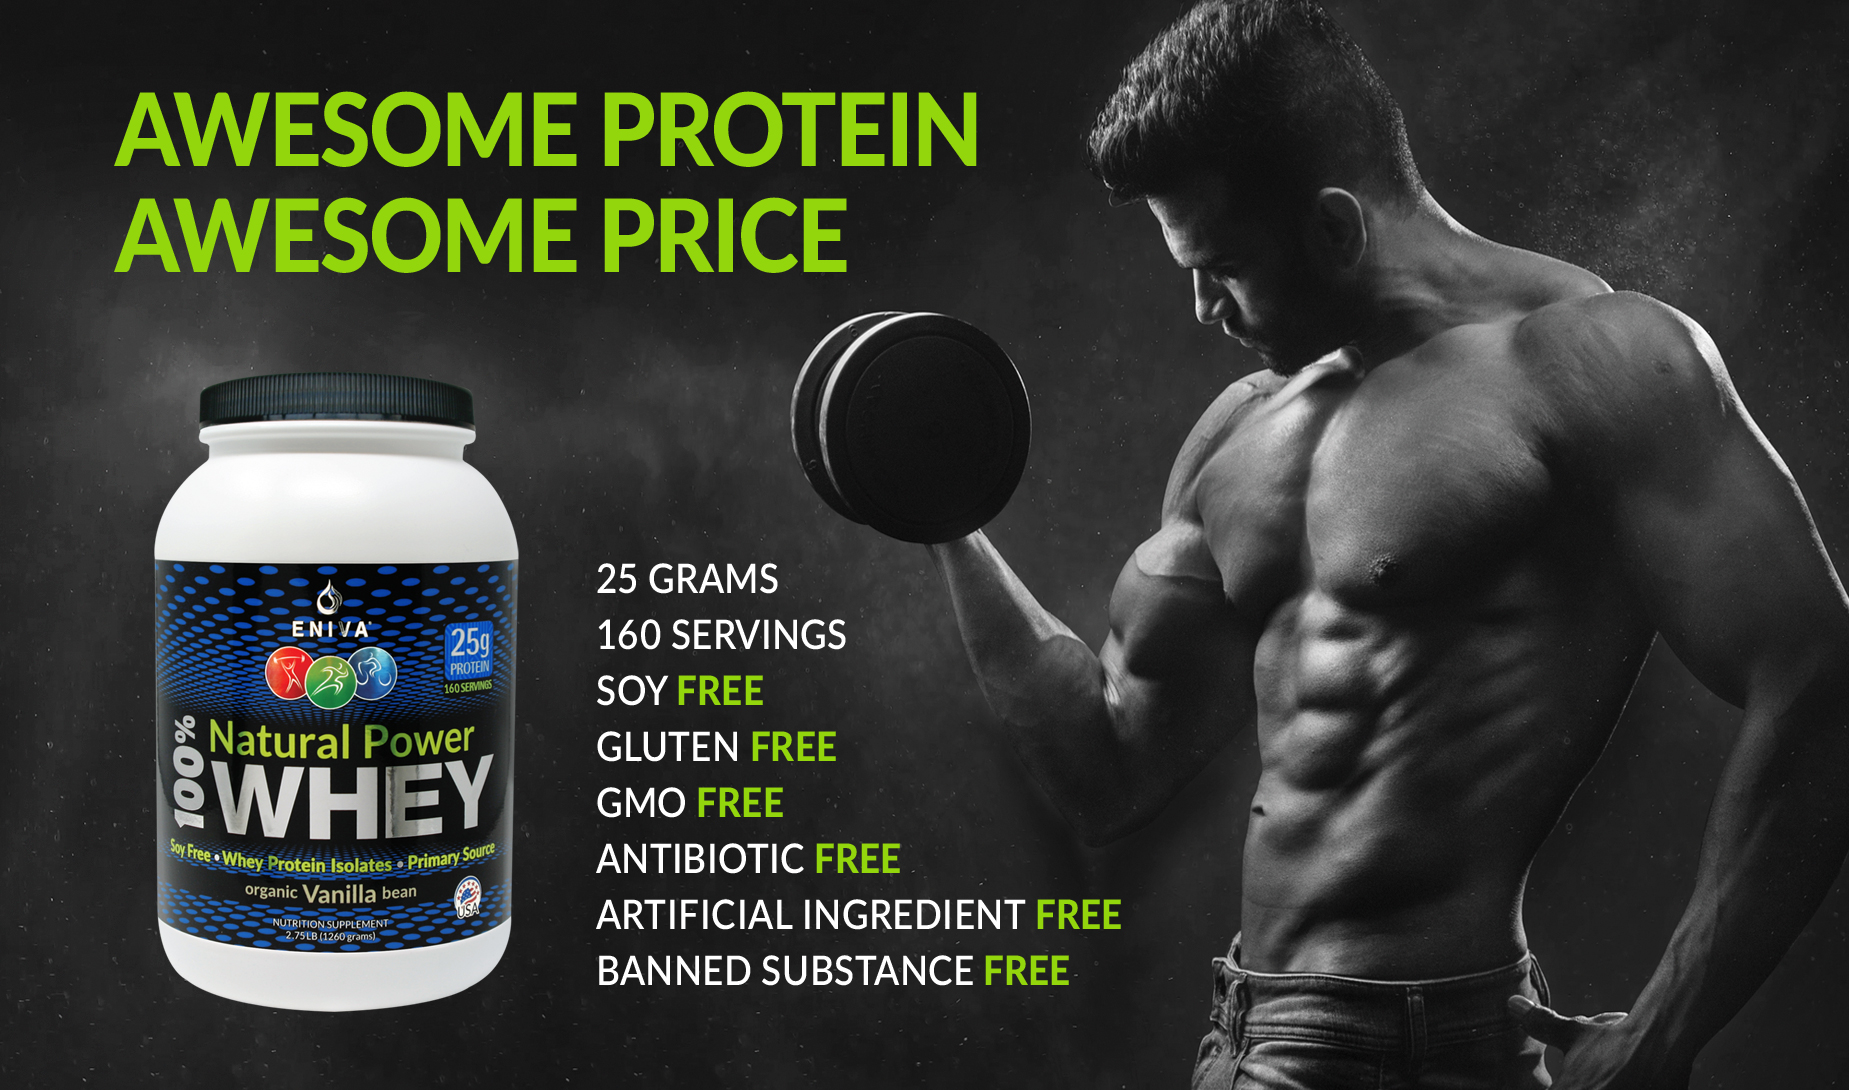 Eniva 100% Natural Whey Protein Powder